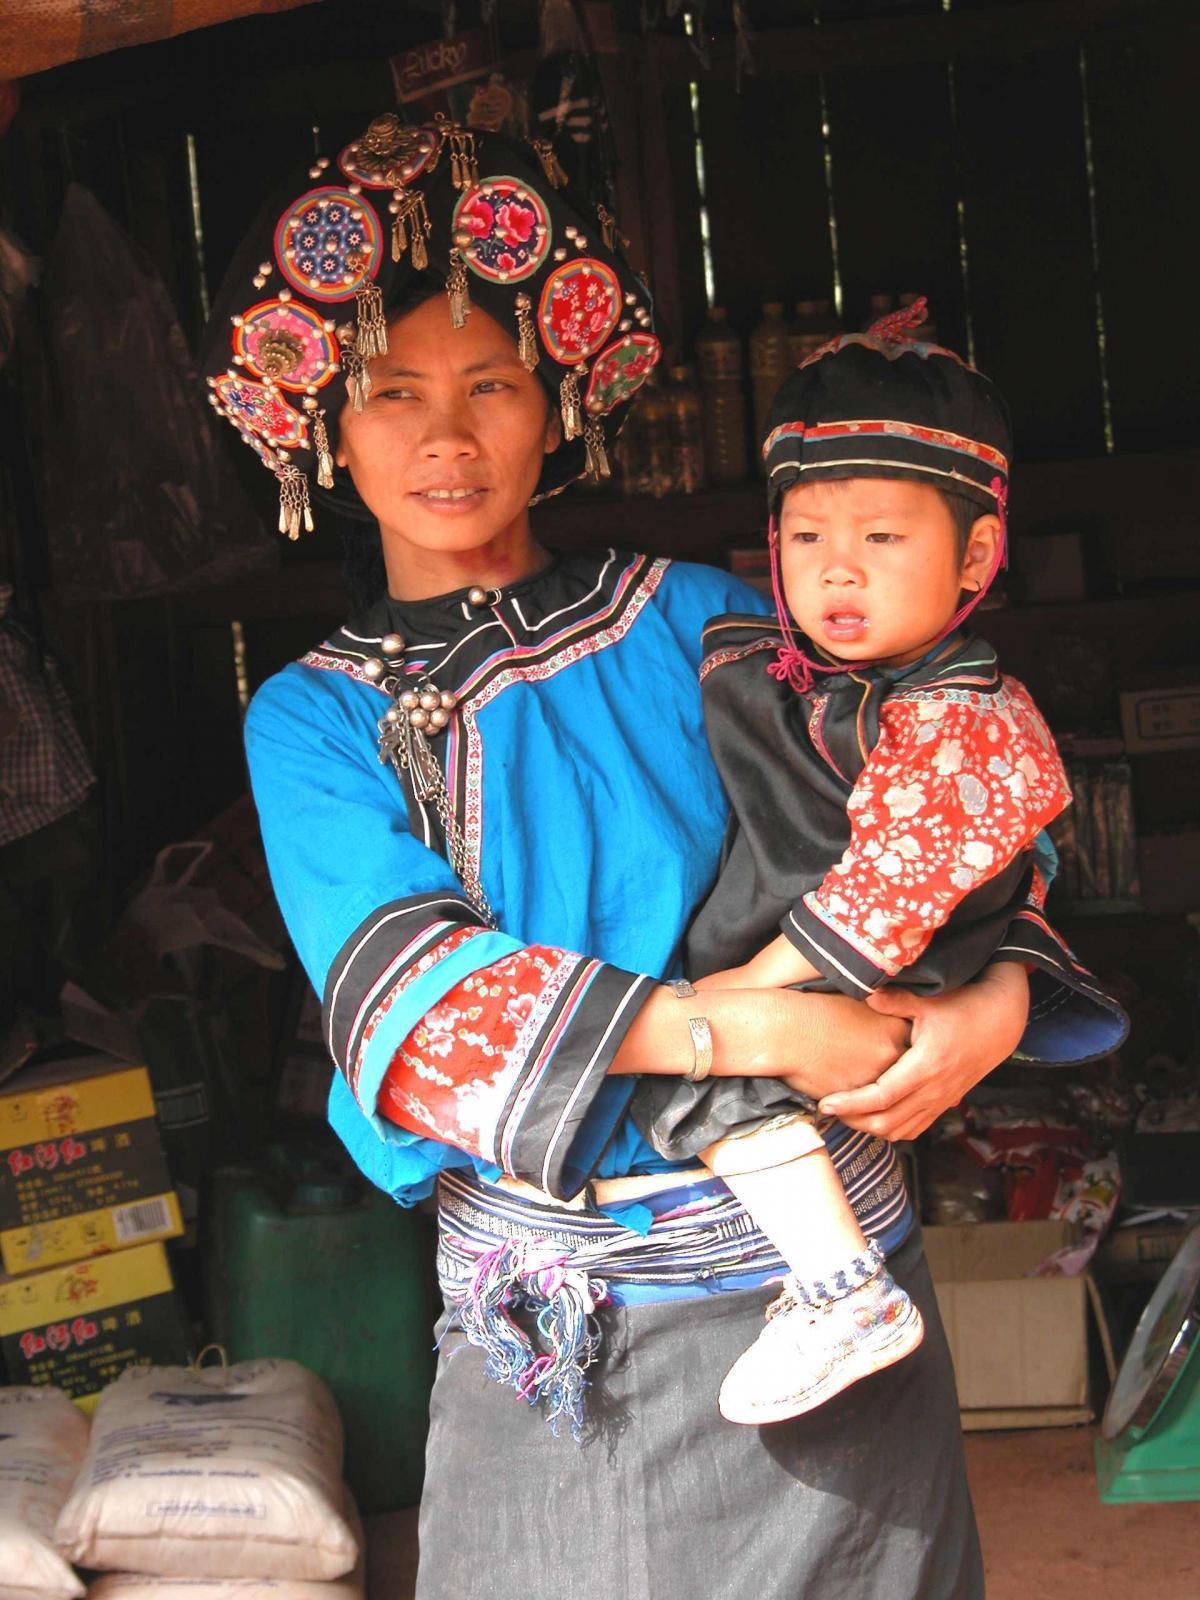 Laosanka s dítětem